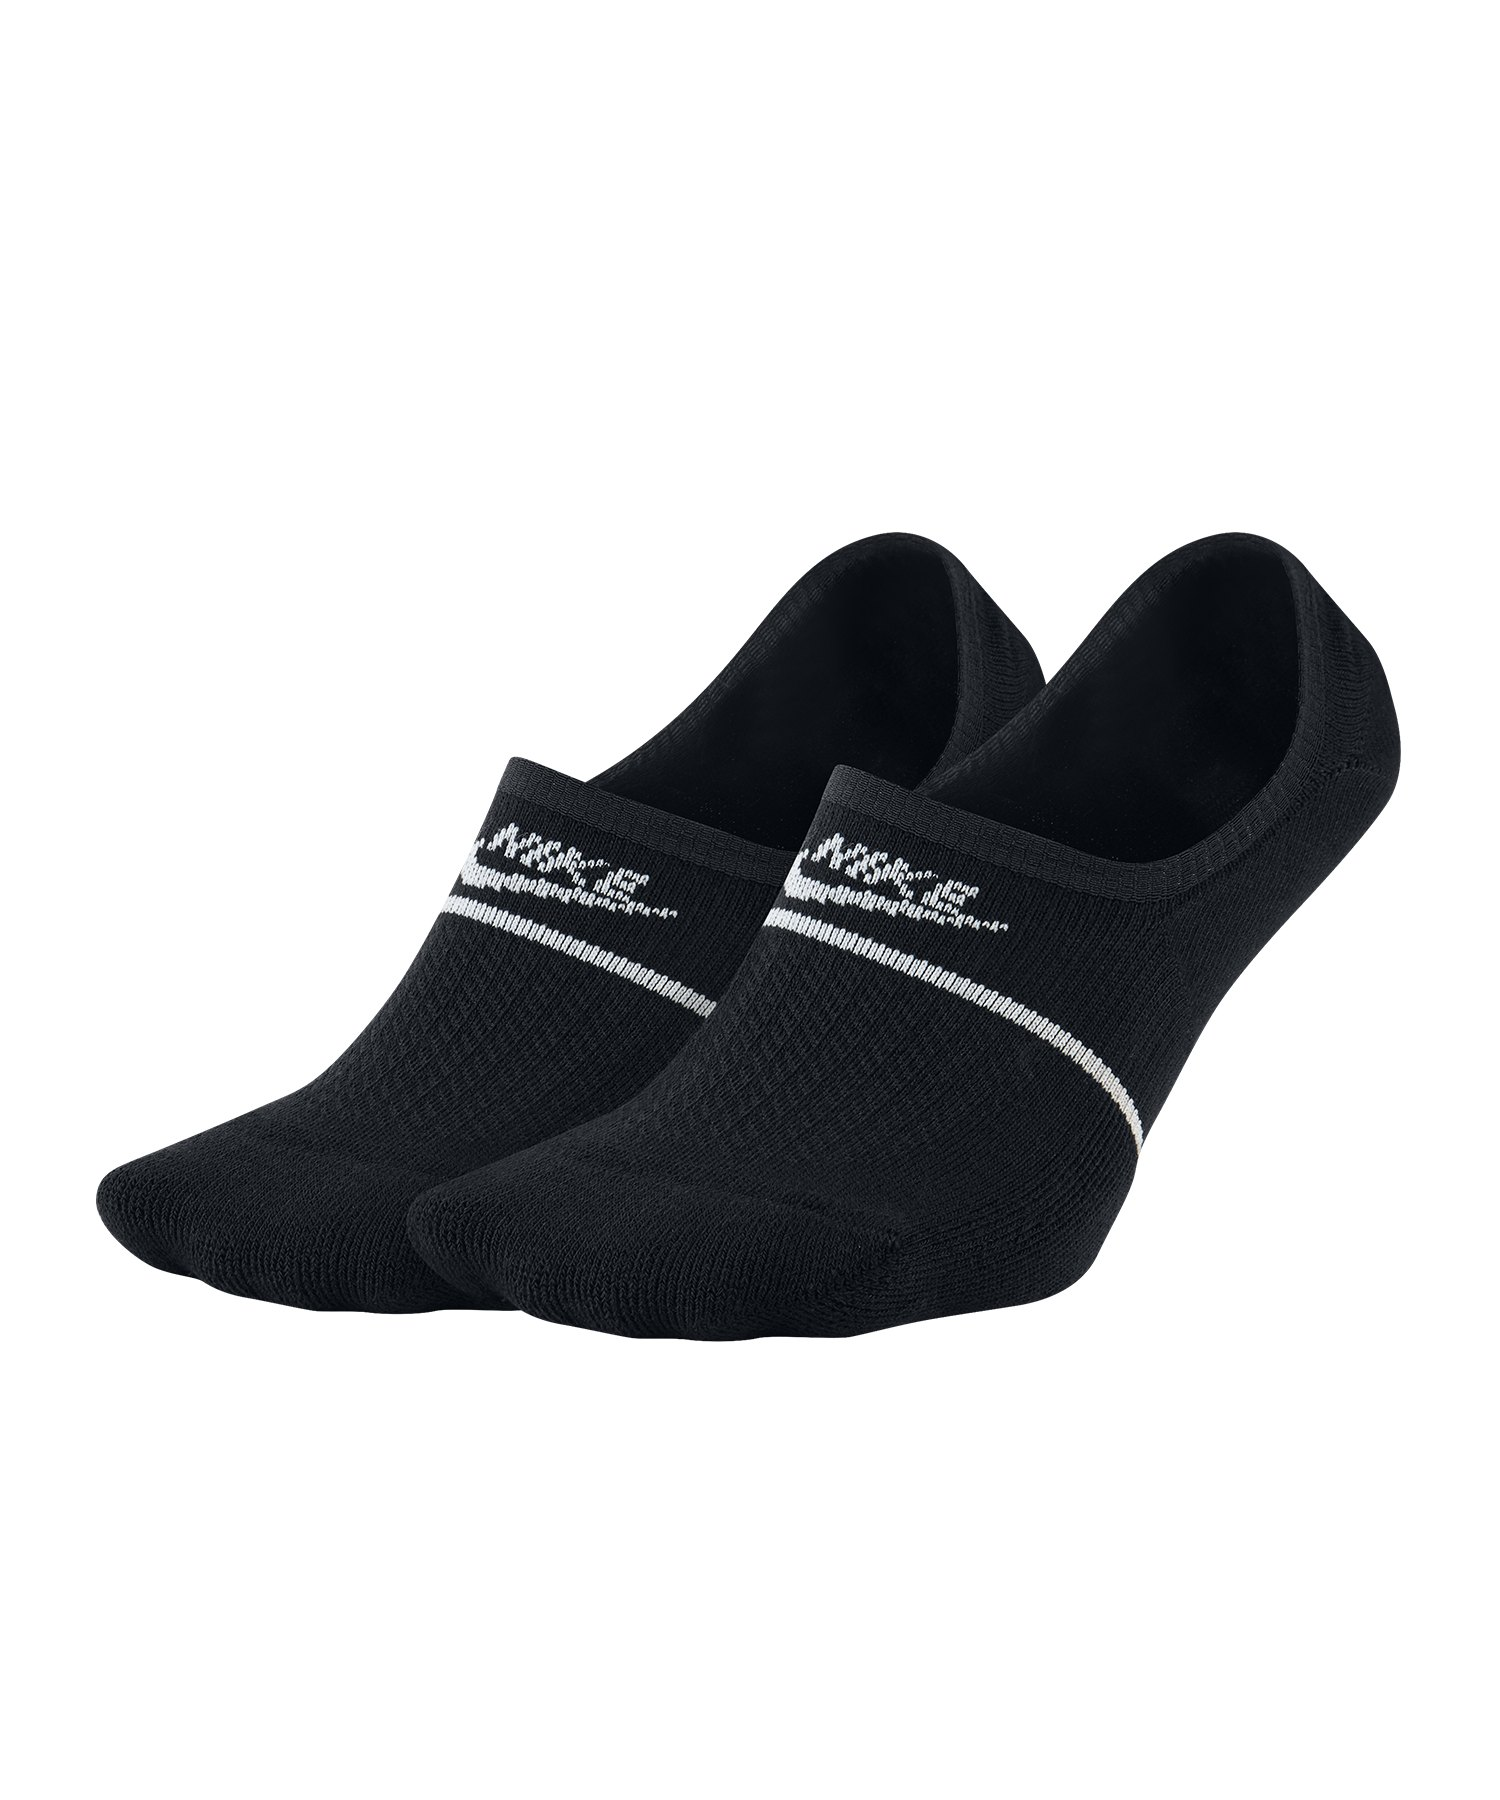 Nike Essential Sneaker Sox Socken 2er Pack F010 - Schwarz